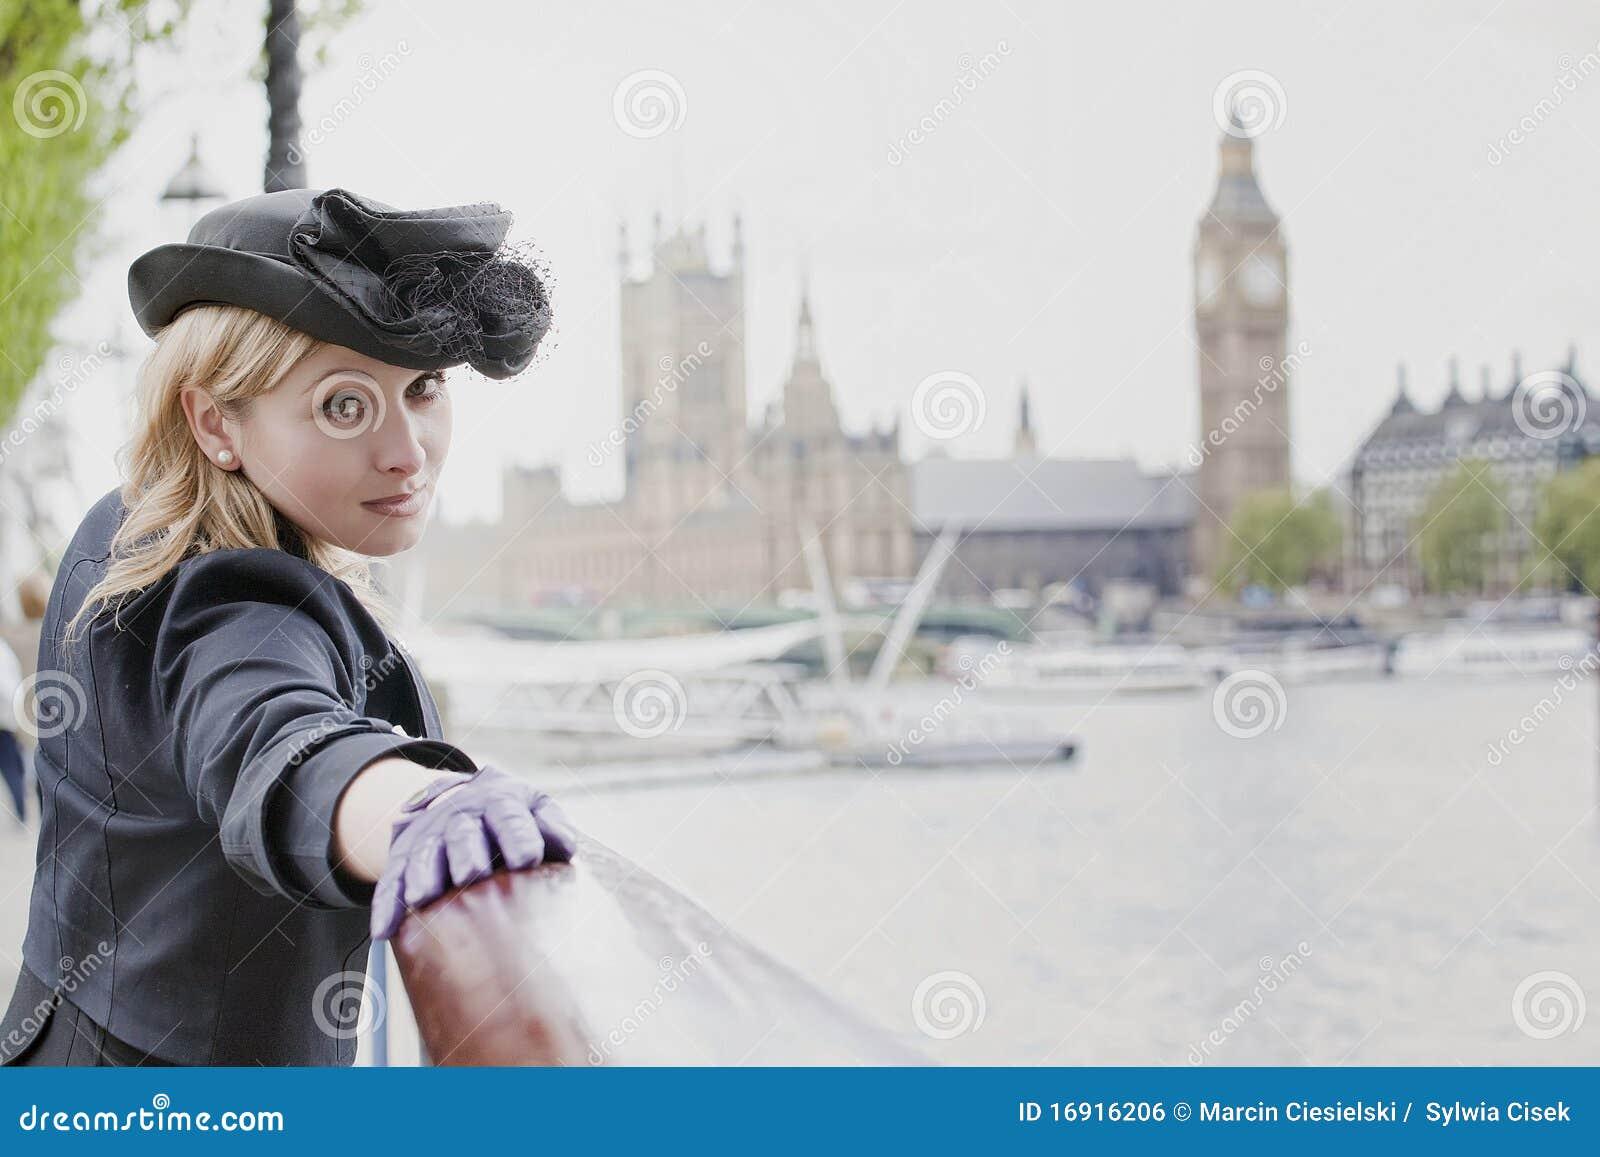 London girl big bum photo xxx photo